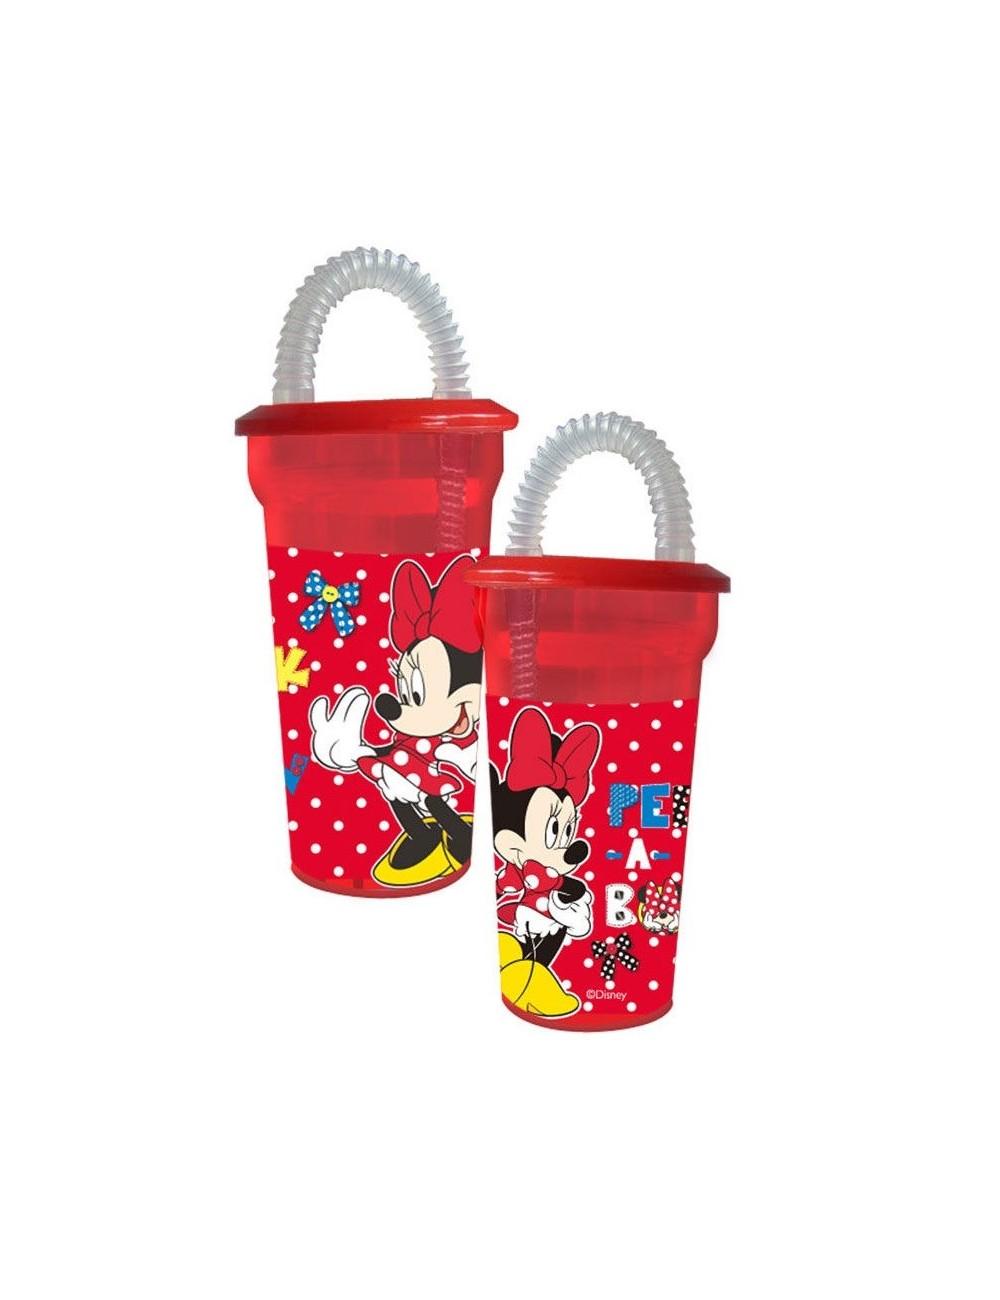 Pahar plastic Minnie Mouse, rosu, cu pai 400 ml